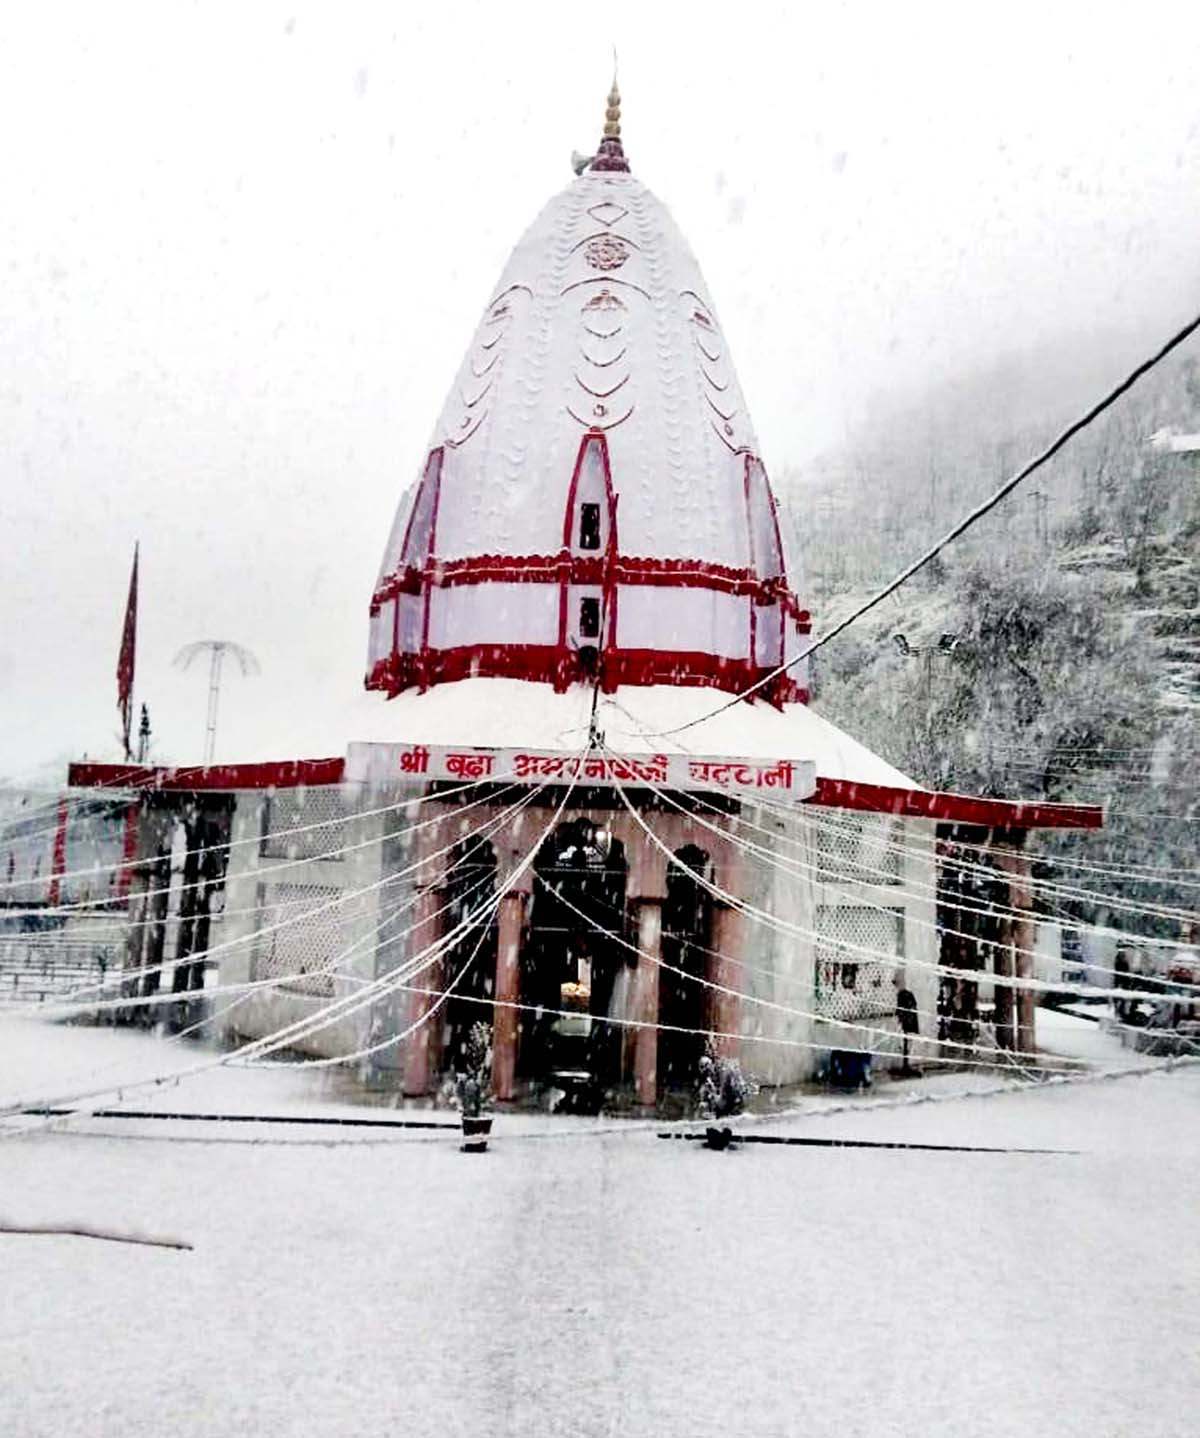 Shri Budha Amarnath Shrine at Mandi witness heavy snowfall on Saturday.